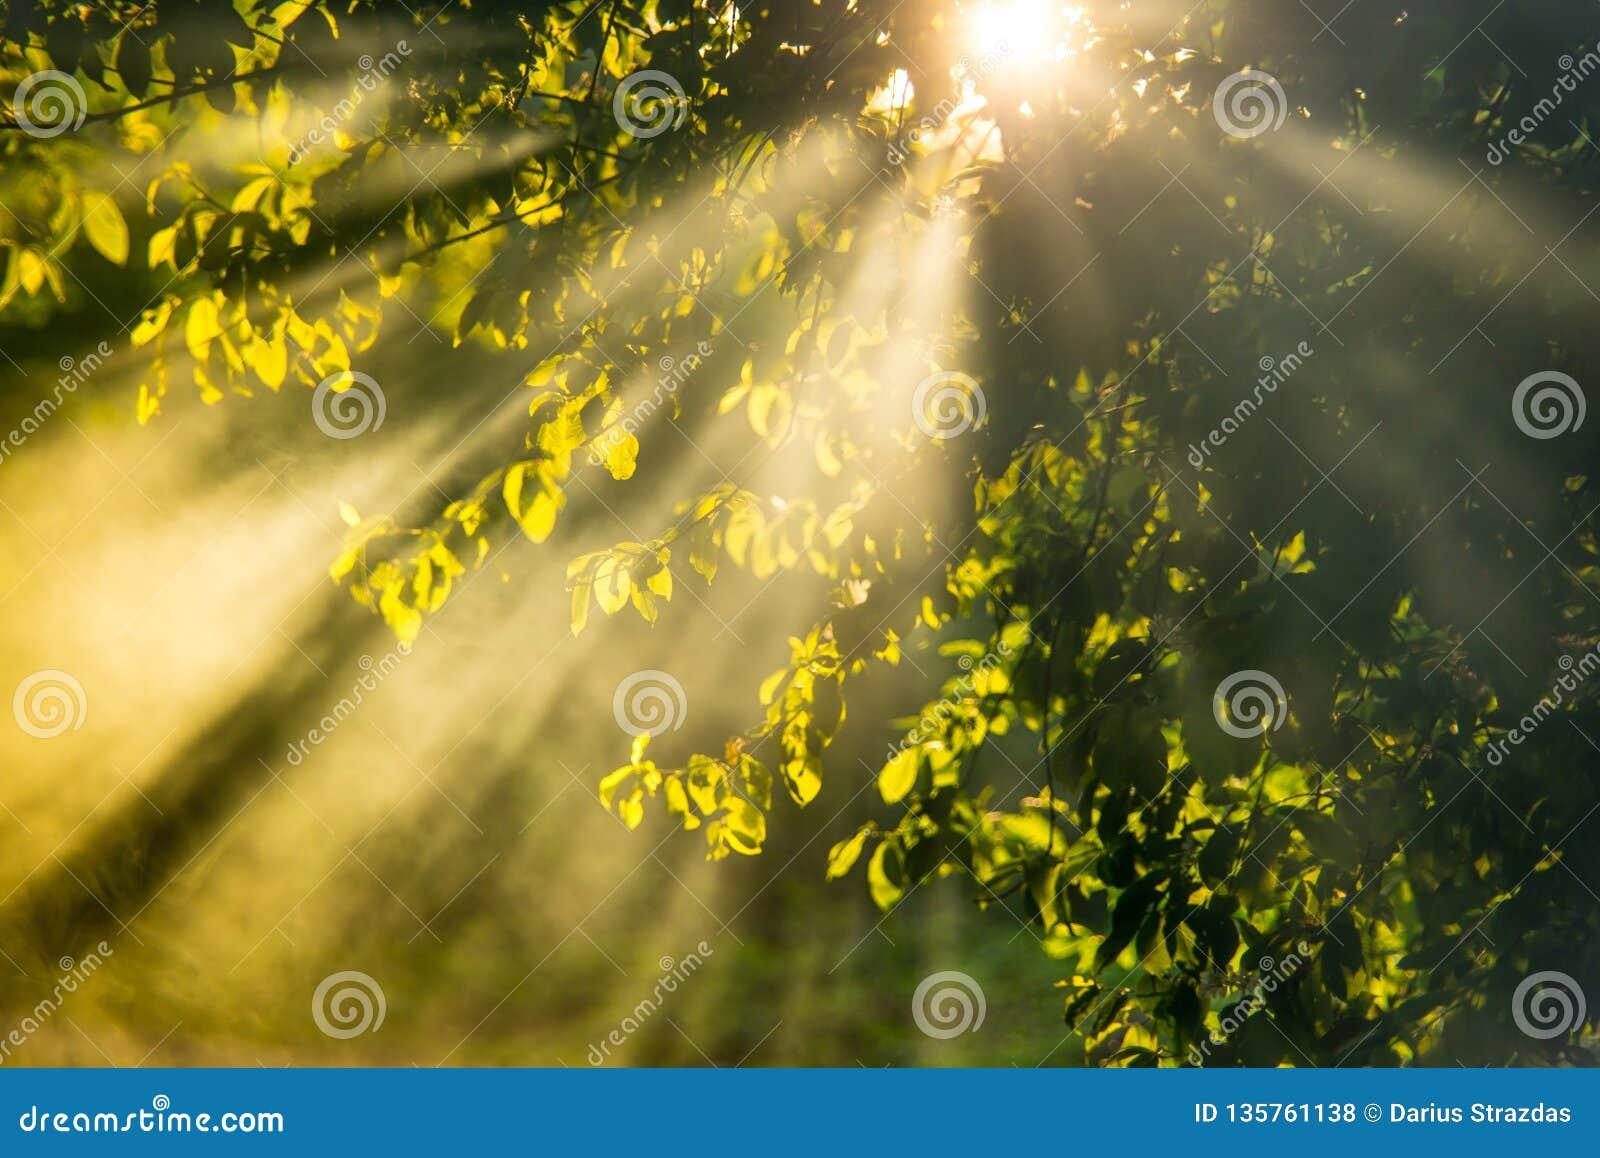 Sunrise beams through mist